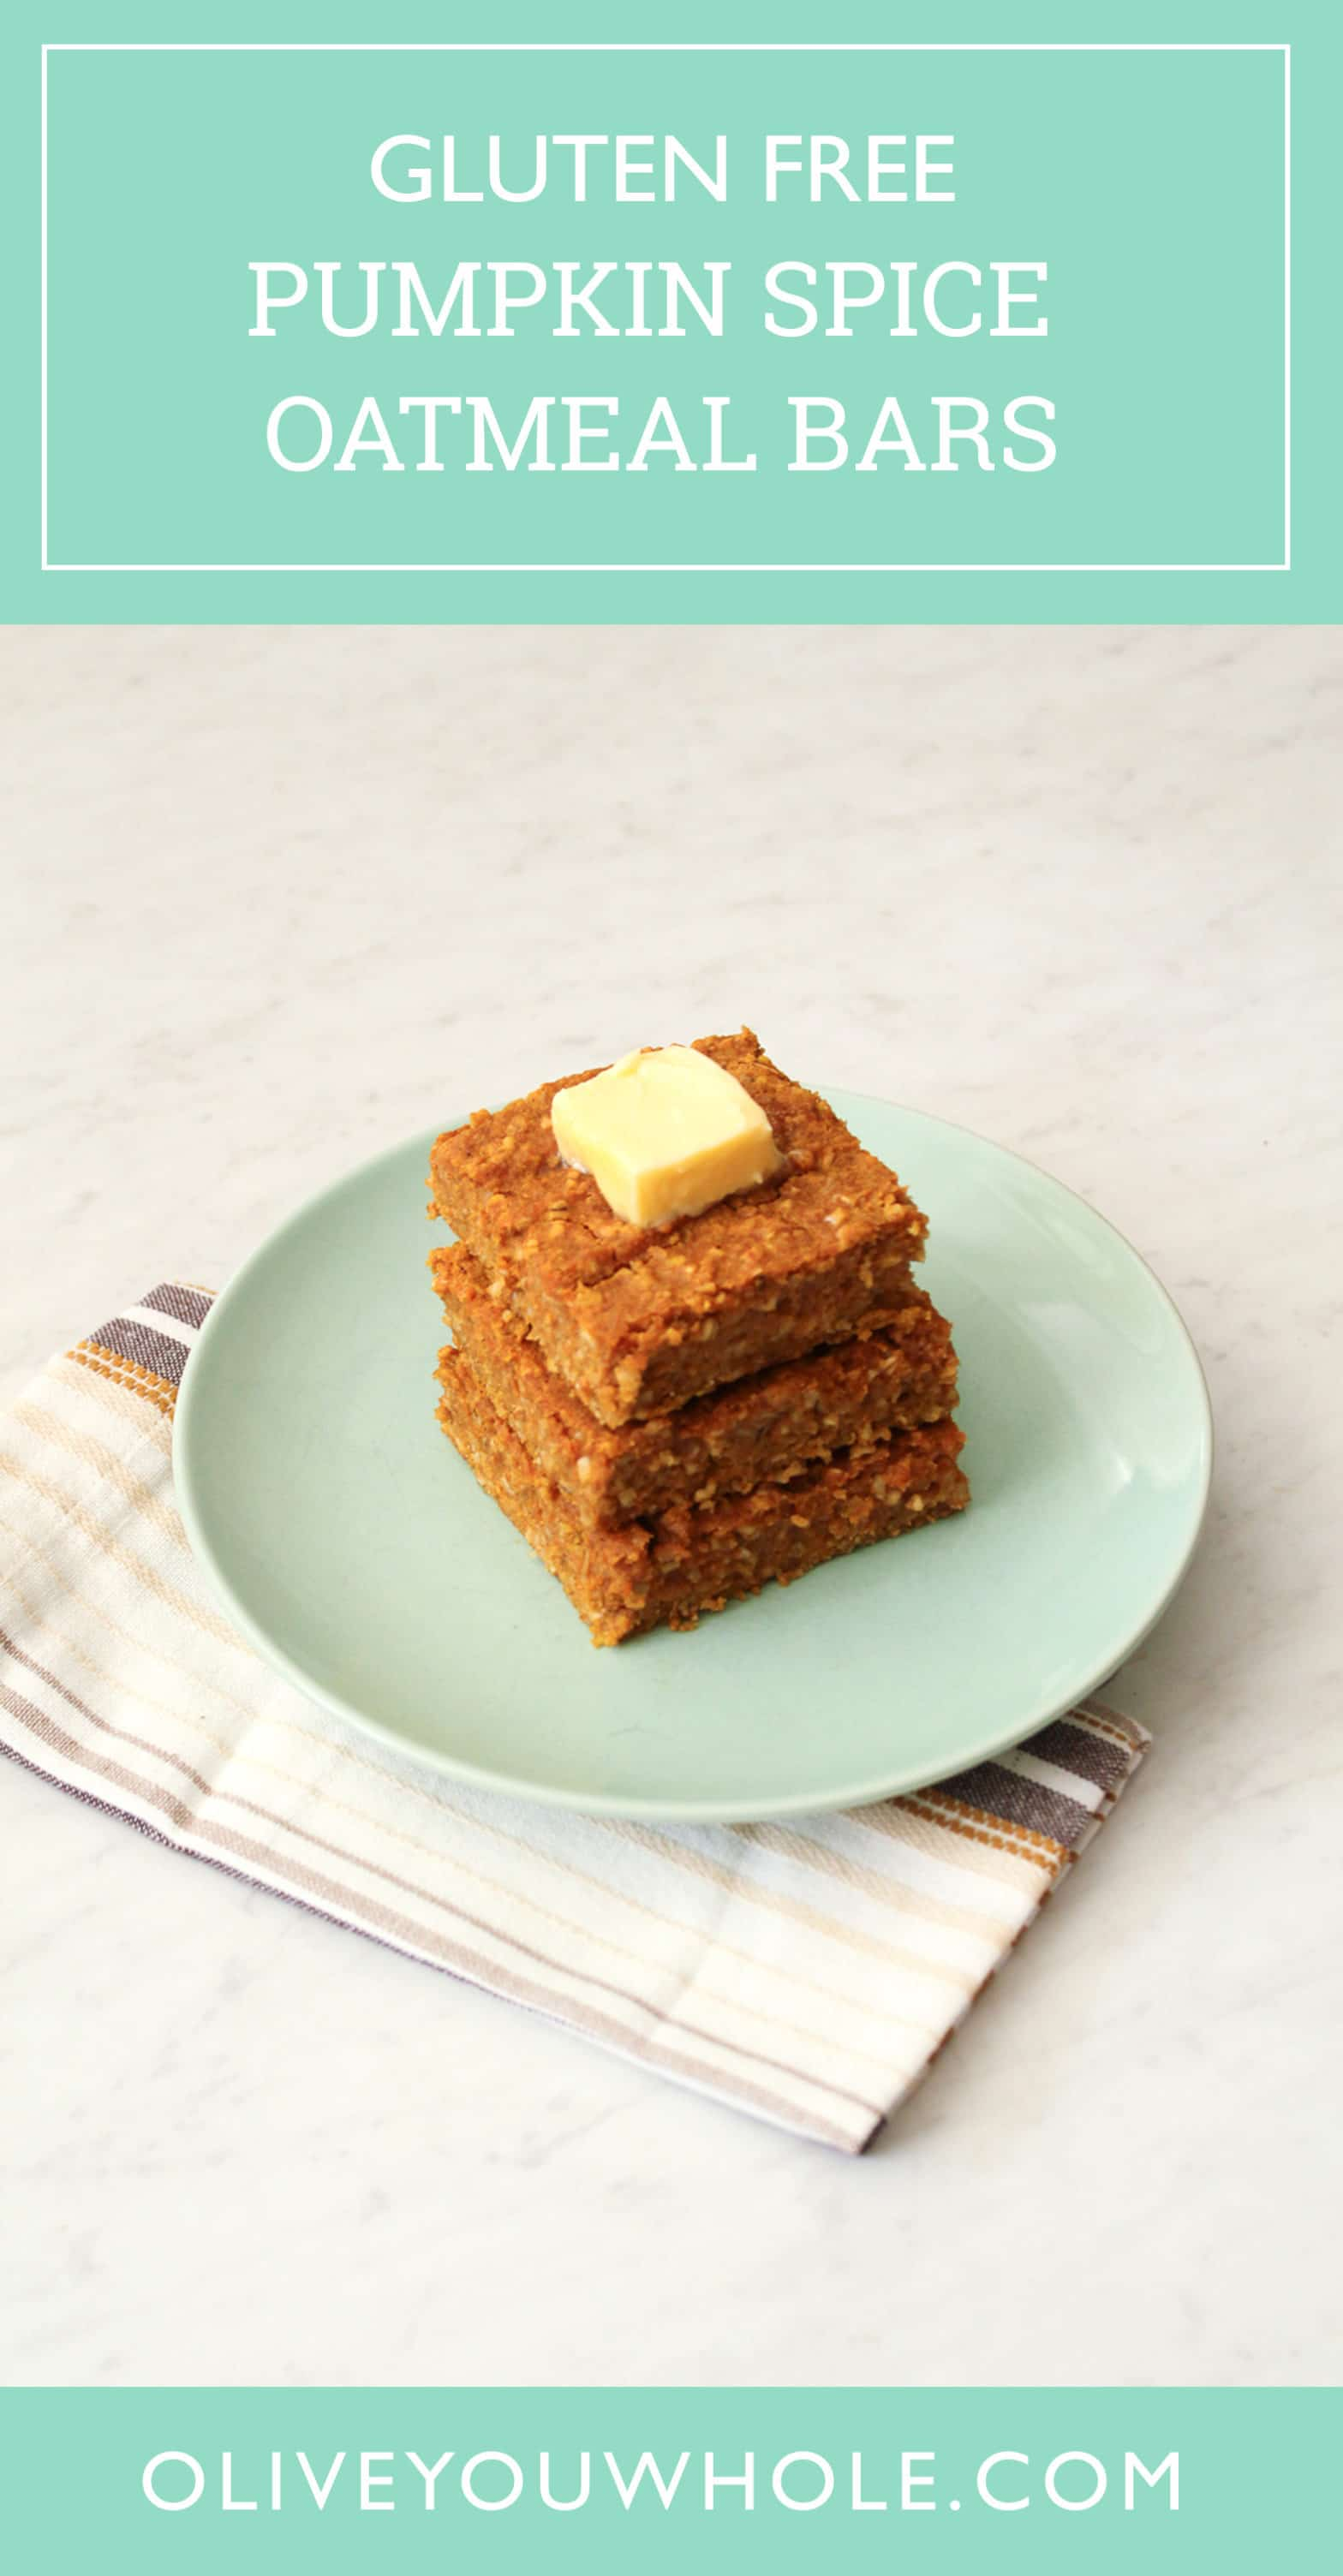 Gluten Free Pumpkin Spice Oatmeal Bars Recipe Pin